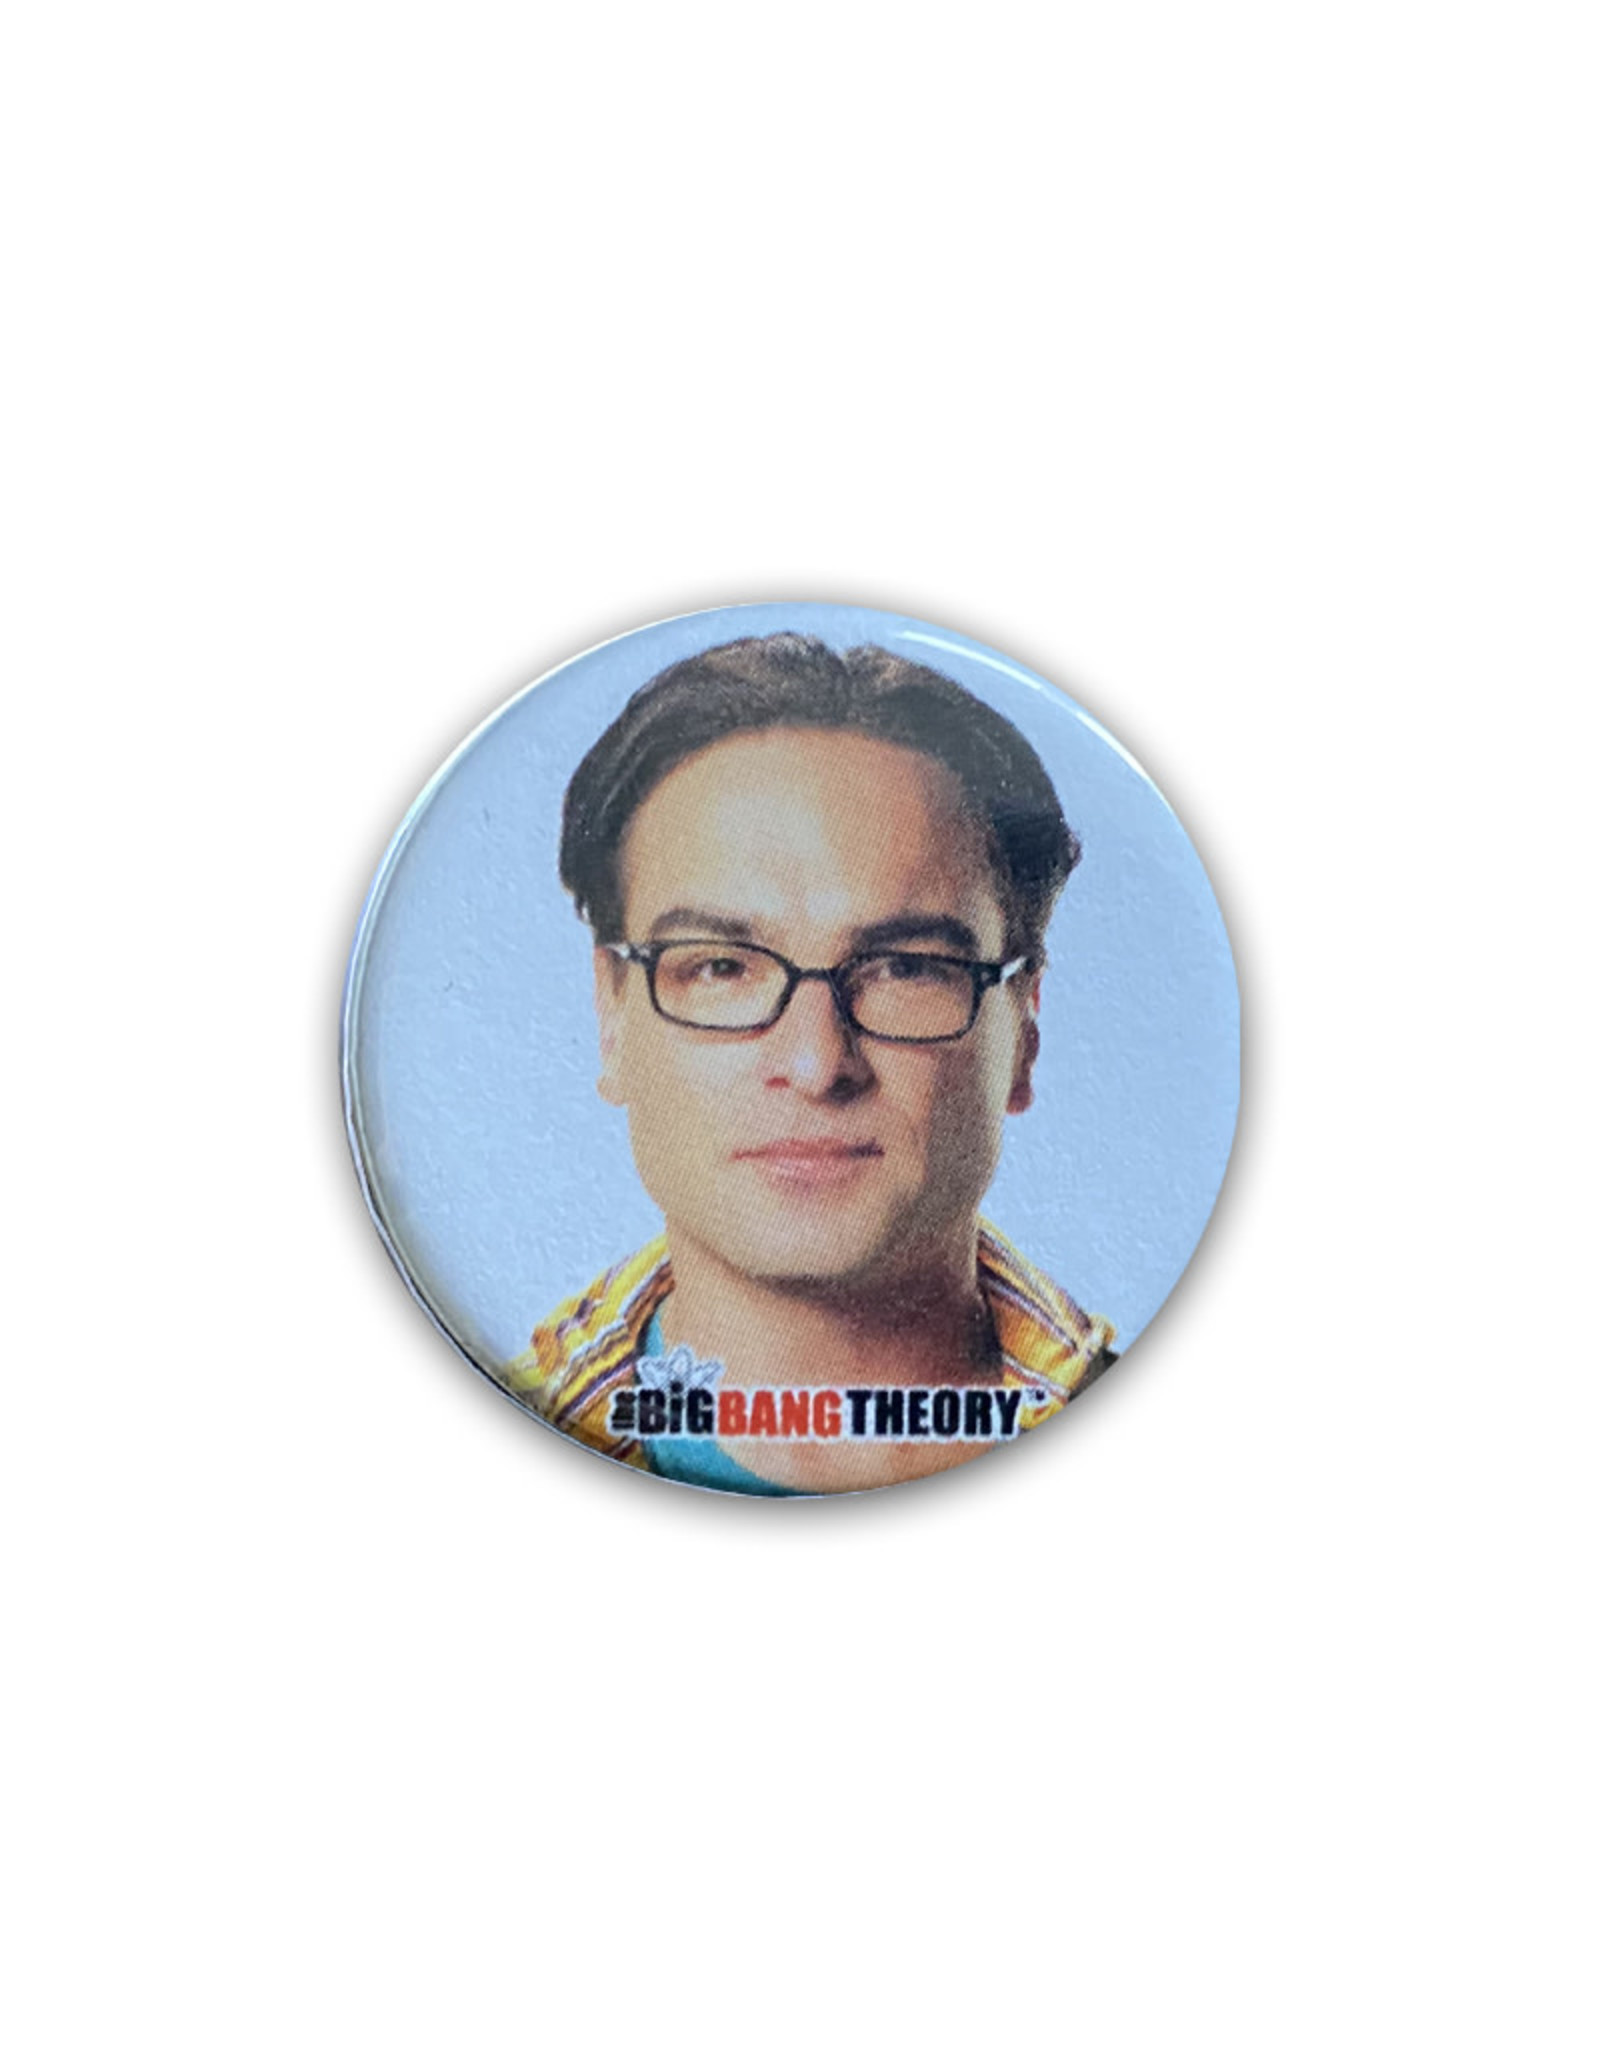 Bing Bang Theory ( Macaron ) Léonard Hofstadter